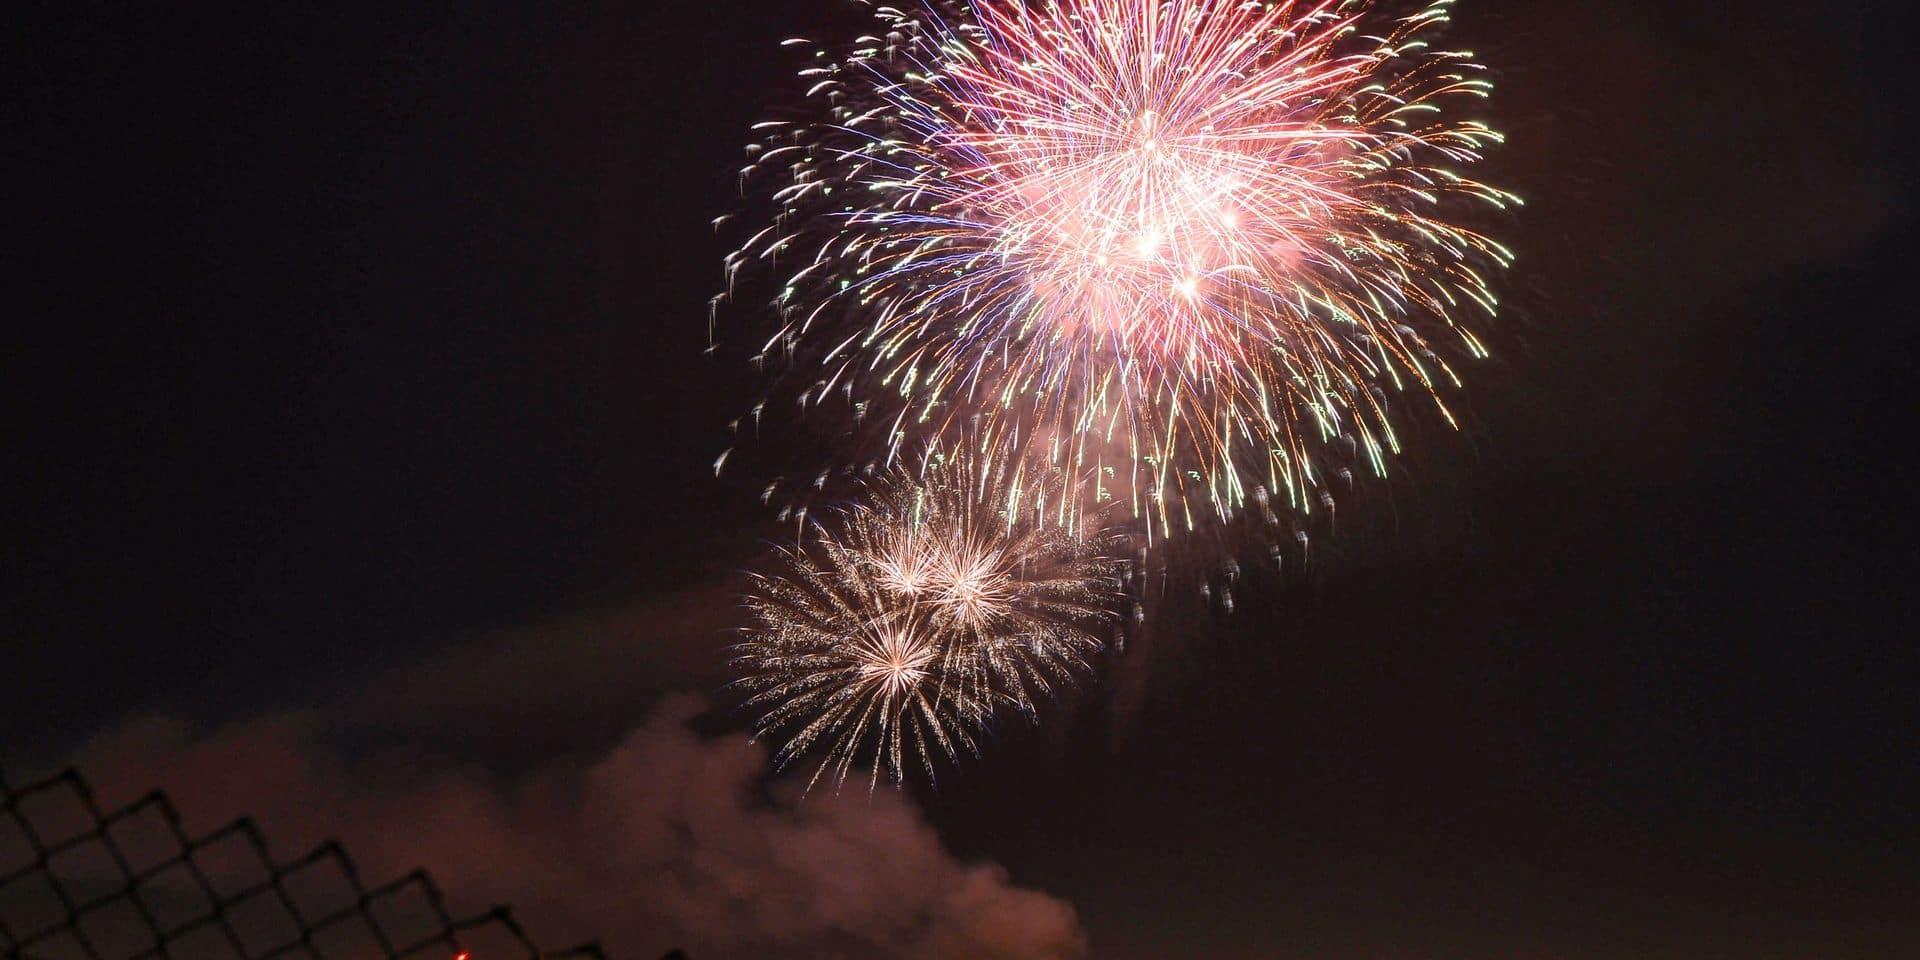 Les feux d'artifice interdits durant les fêtes?